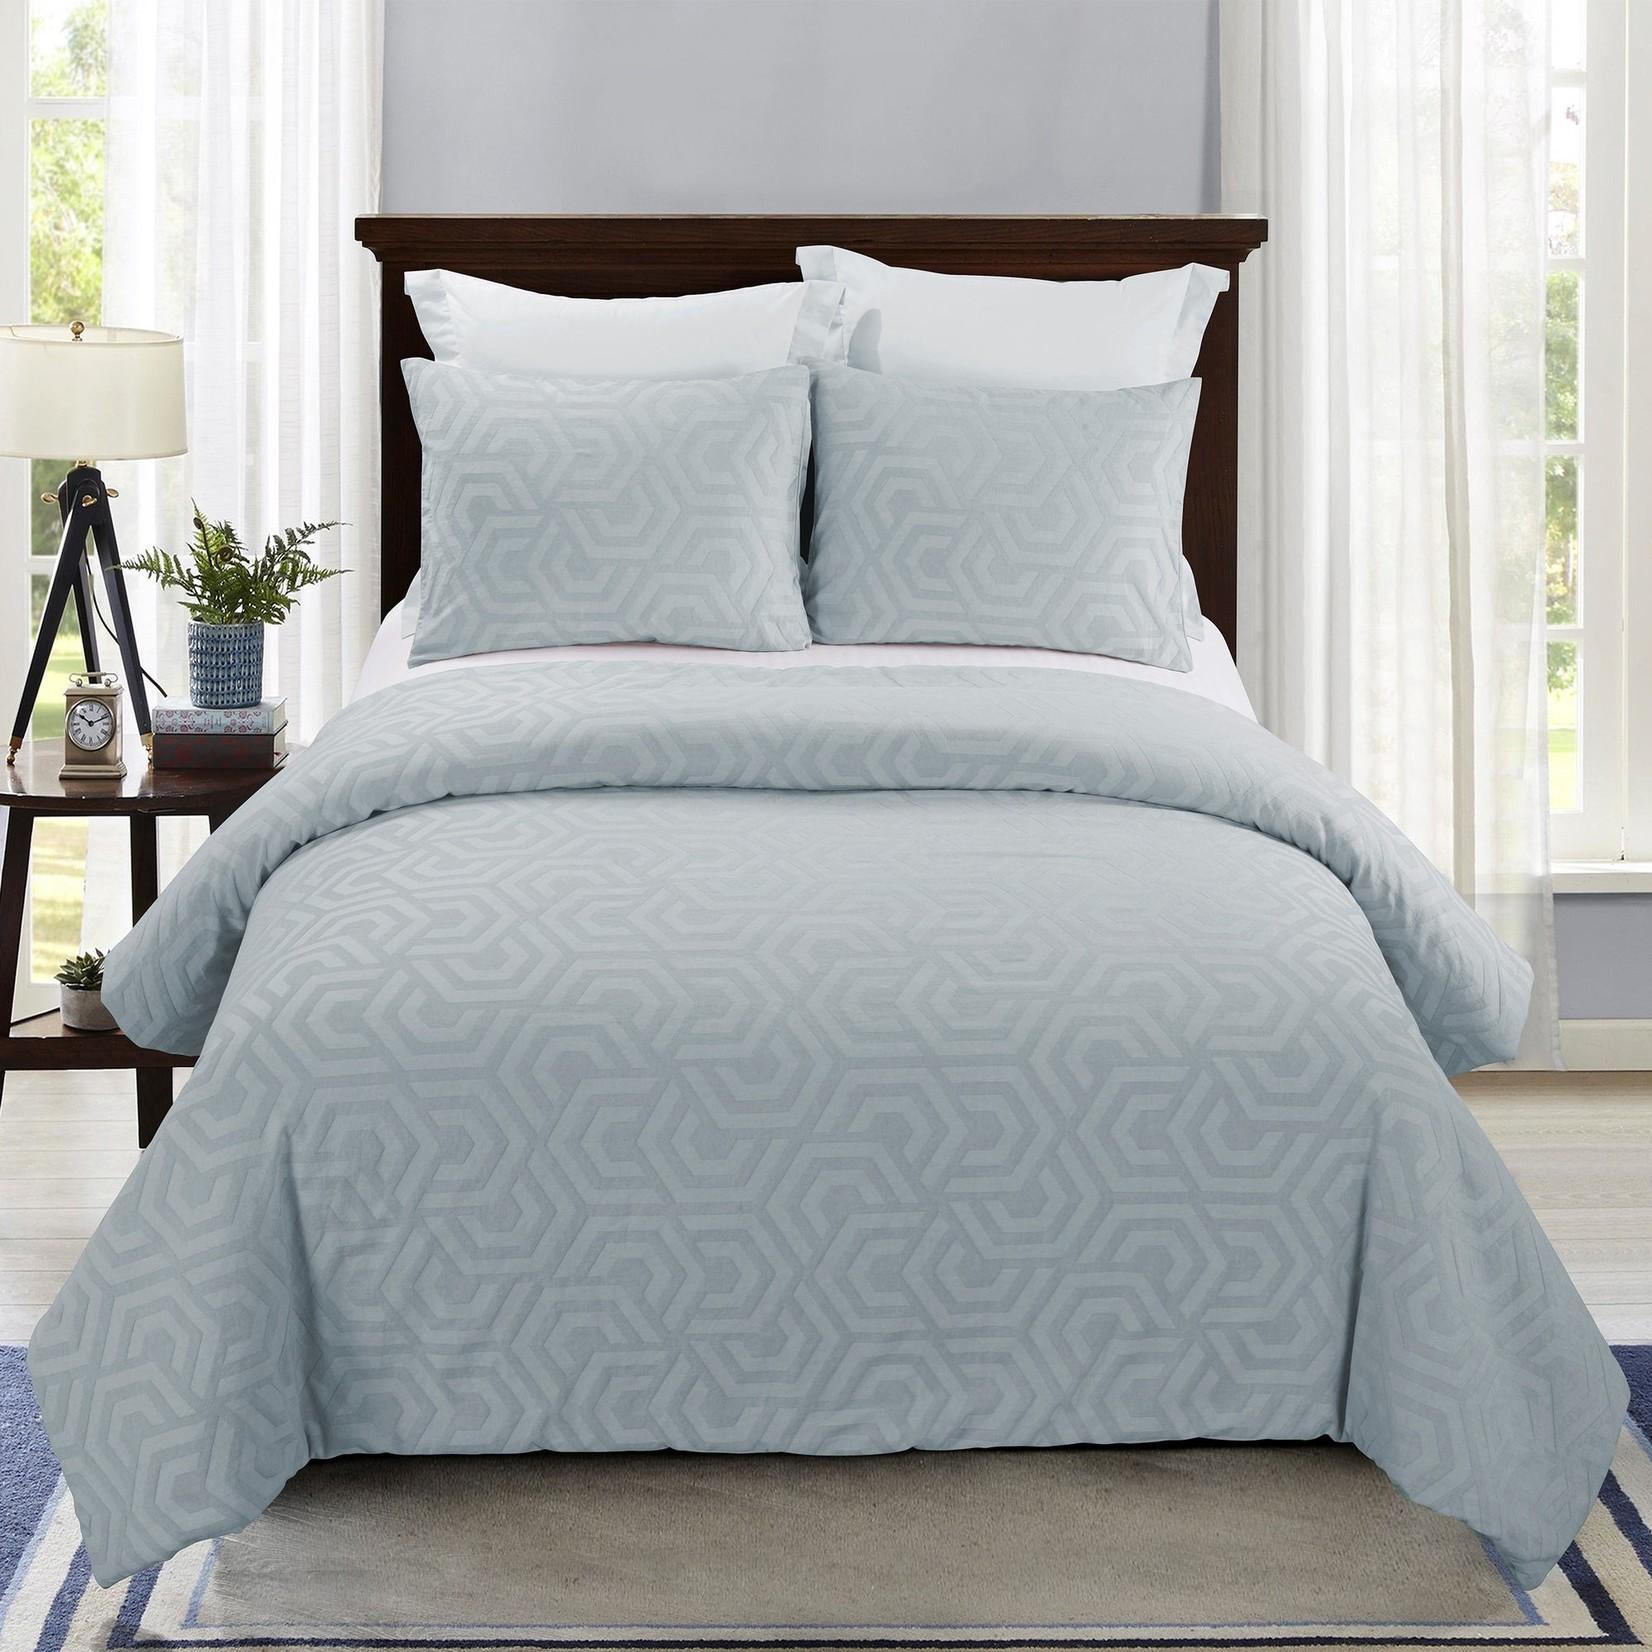 *Queen - Your Lifestyle Seville Comforter Set - Final Sale